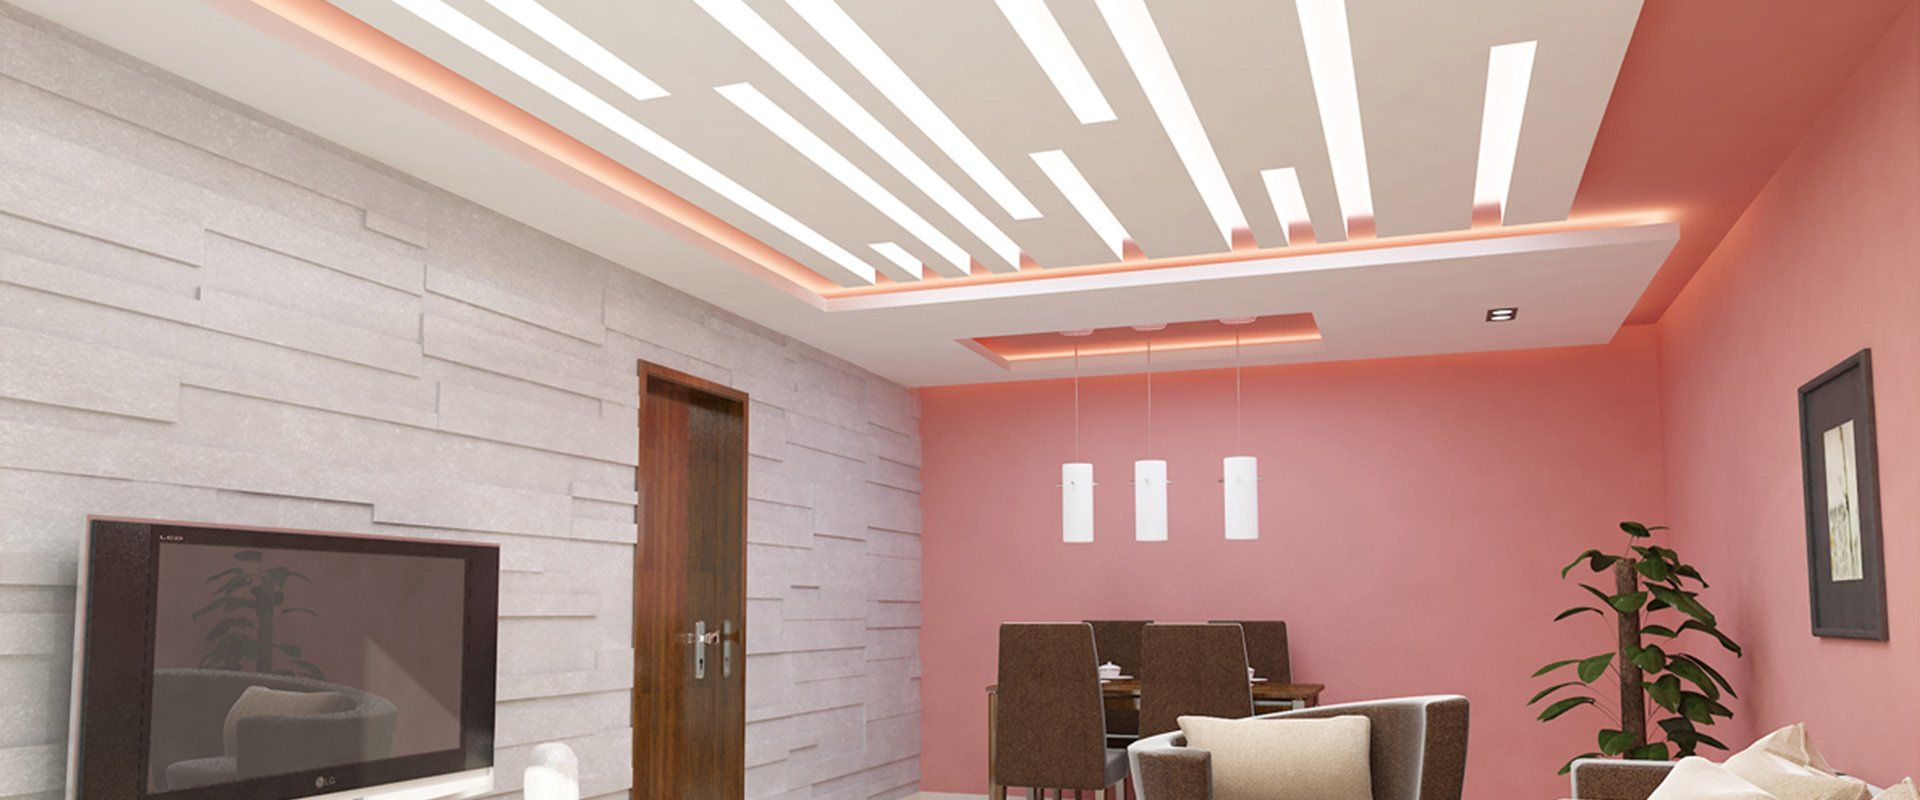 False Ceiling   Gypsum Board   Drywall   Plaster  Saint ...